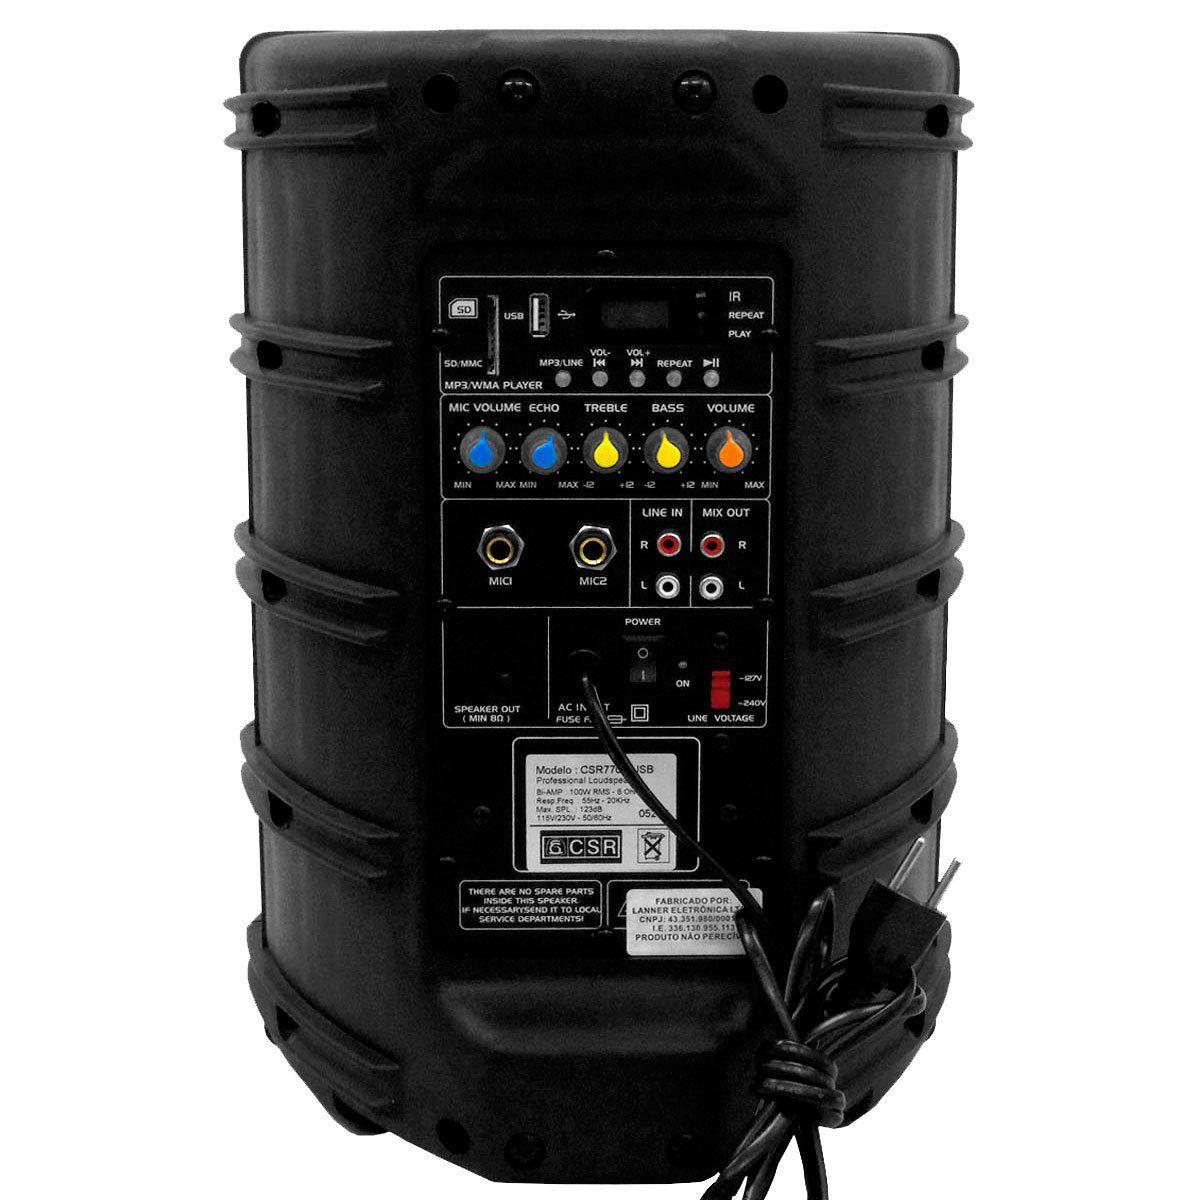 CAIXA AMPLIFICADA 770 A - CSR - 8 Polegadas 100W c/ USB